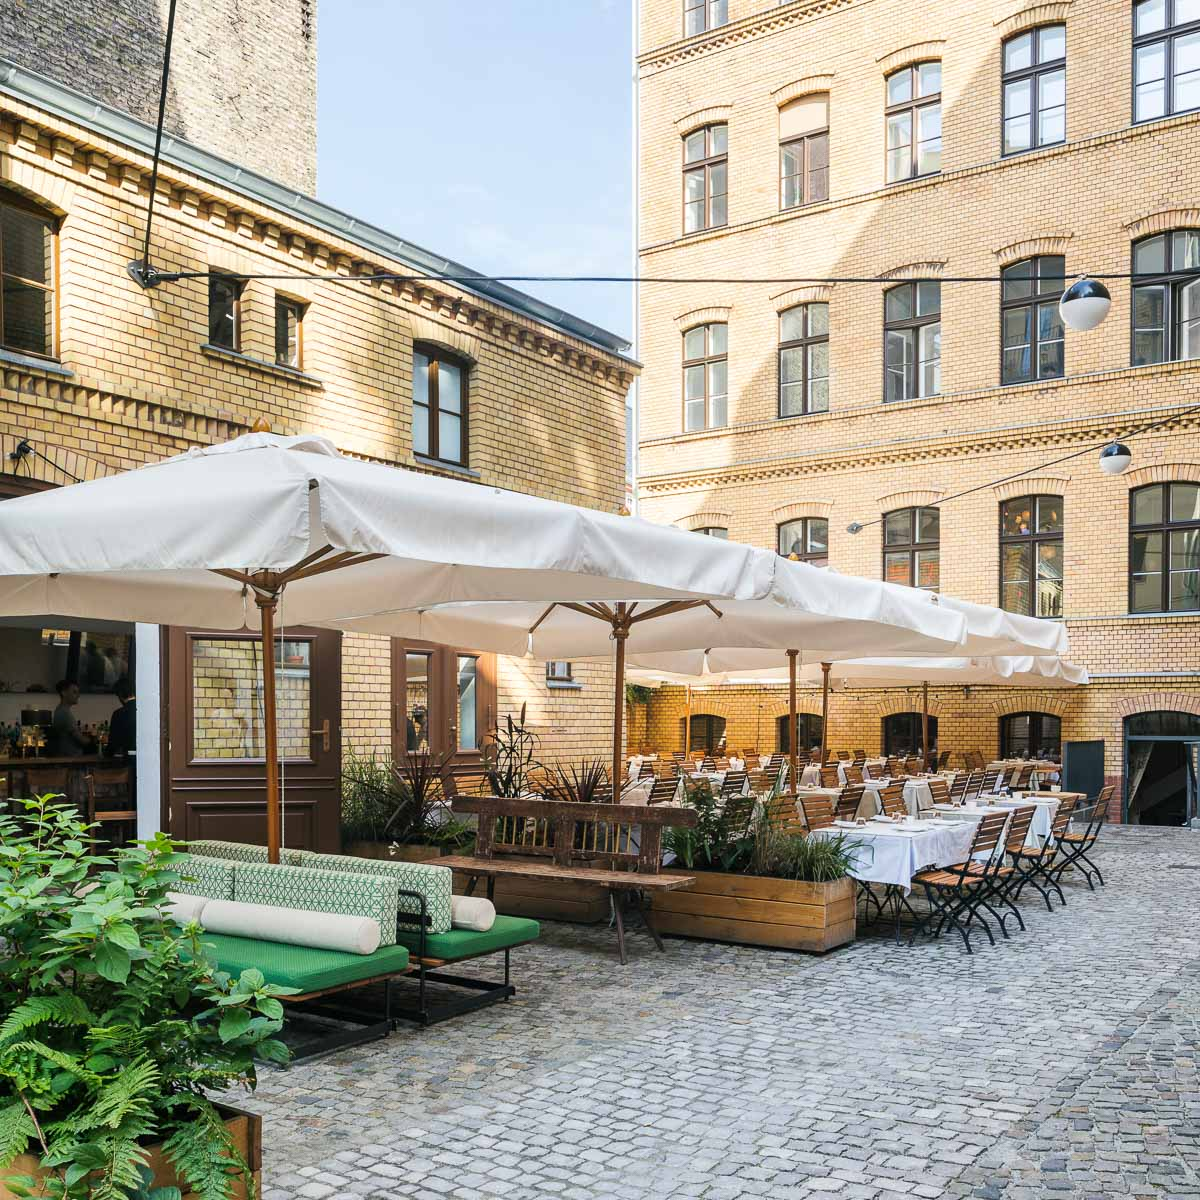 Restaurant Panama an der Potsdamerstraße in Berlin-3